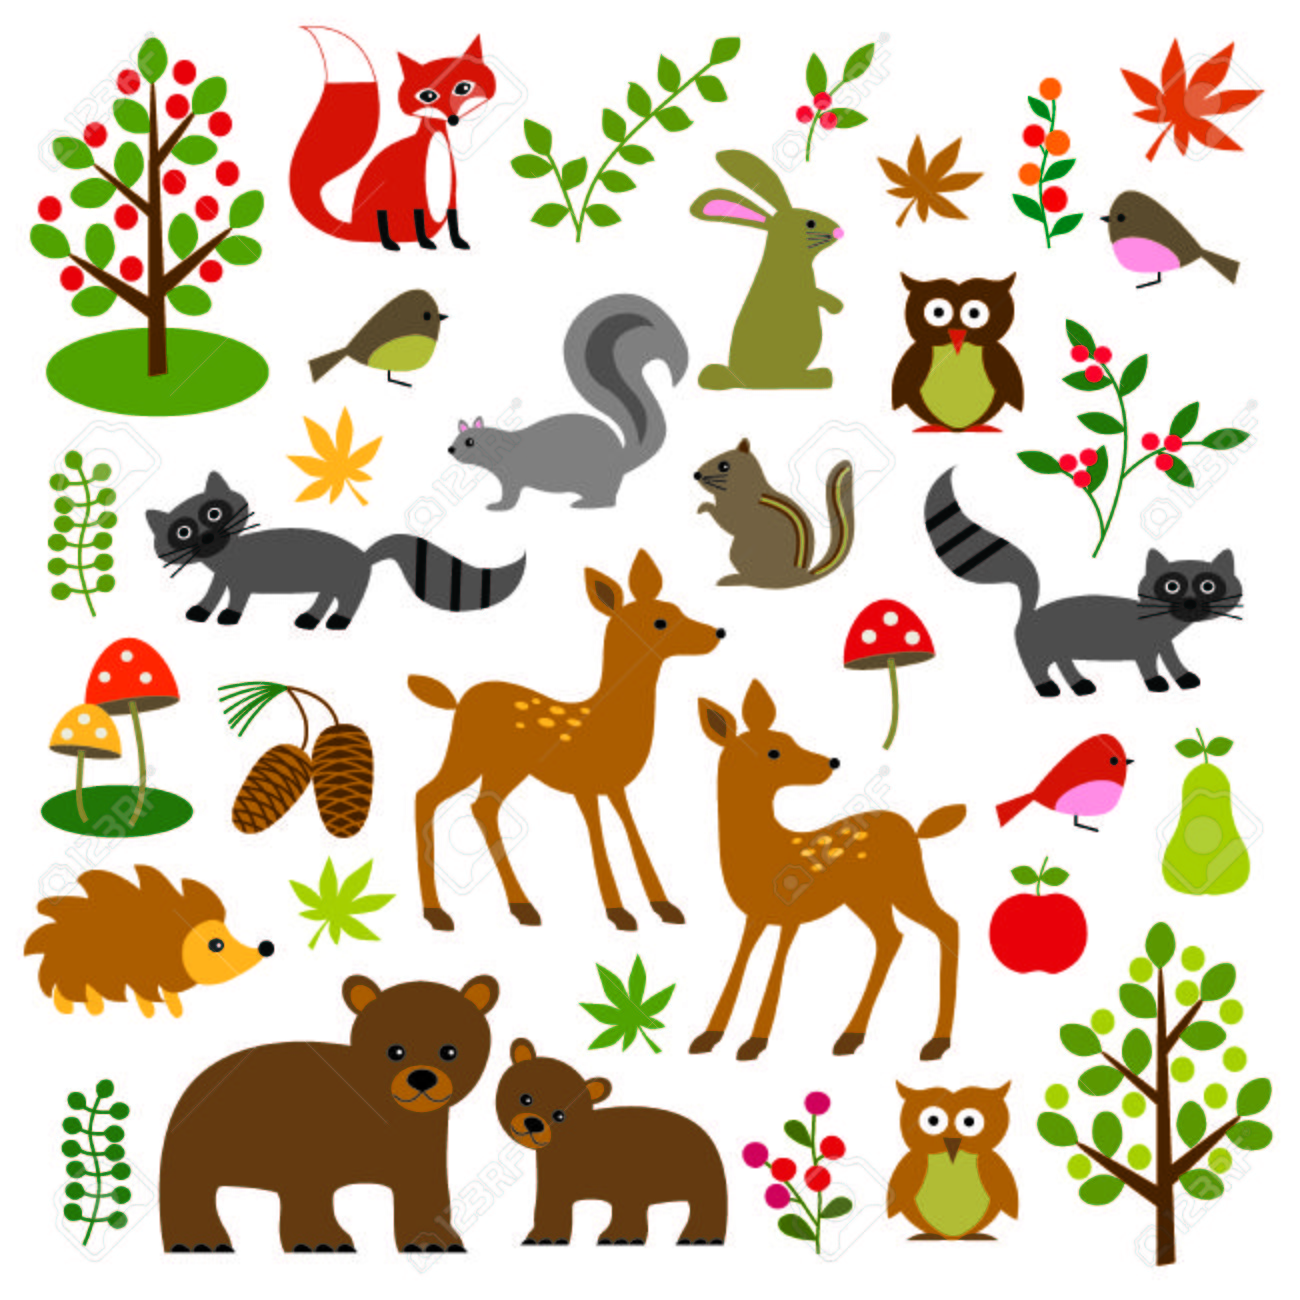 woodland wildlife clipart royalty free cliparts vectors and stock rh 123rf com Free Nature Clip Art Baby Animal Clip Art Free